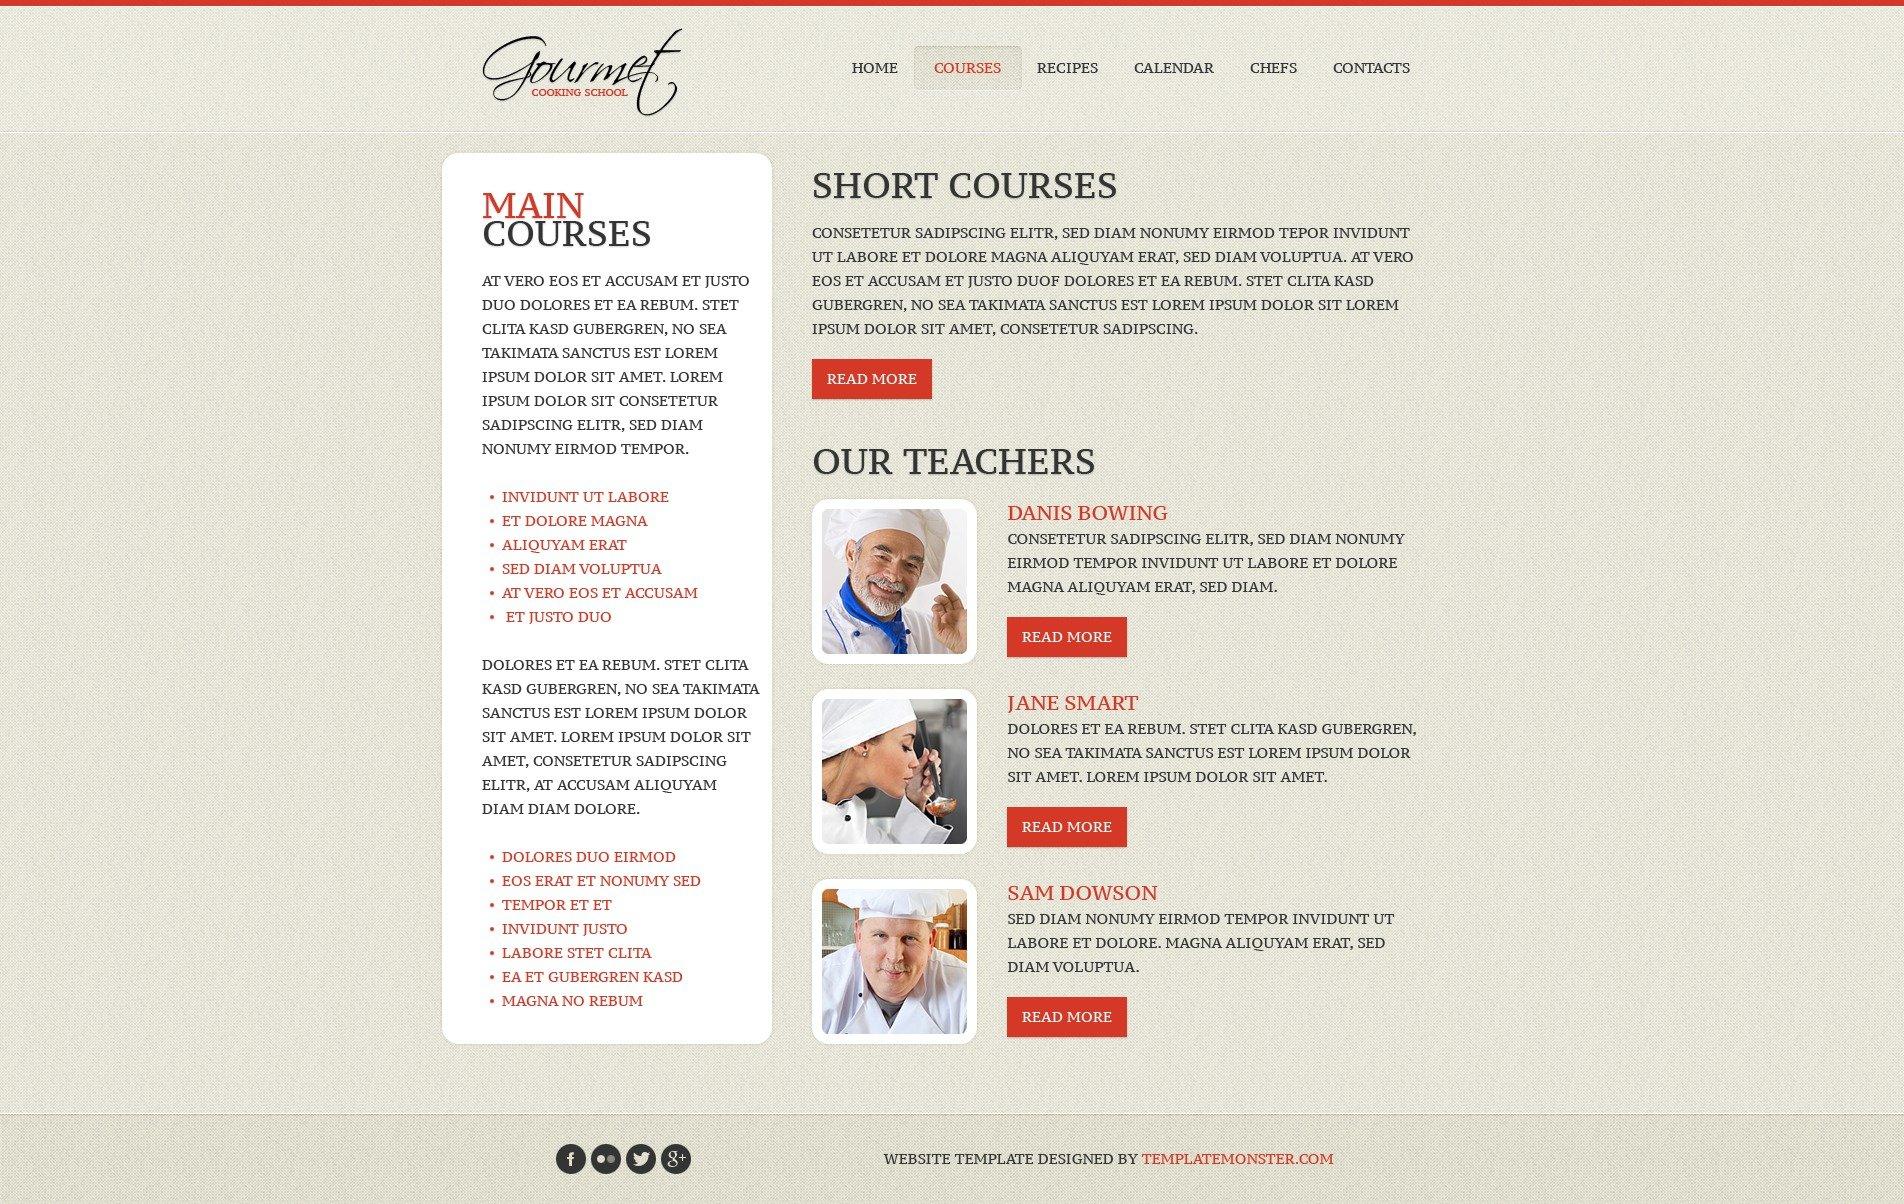 Free Website Template - Cooking Website Template - screenshot